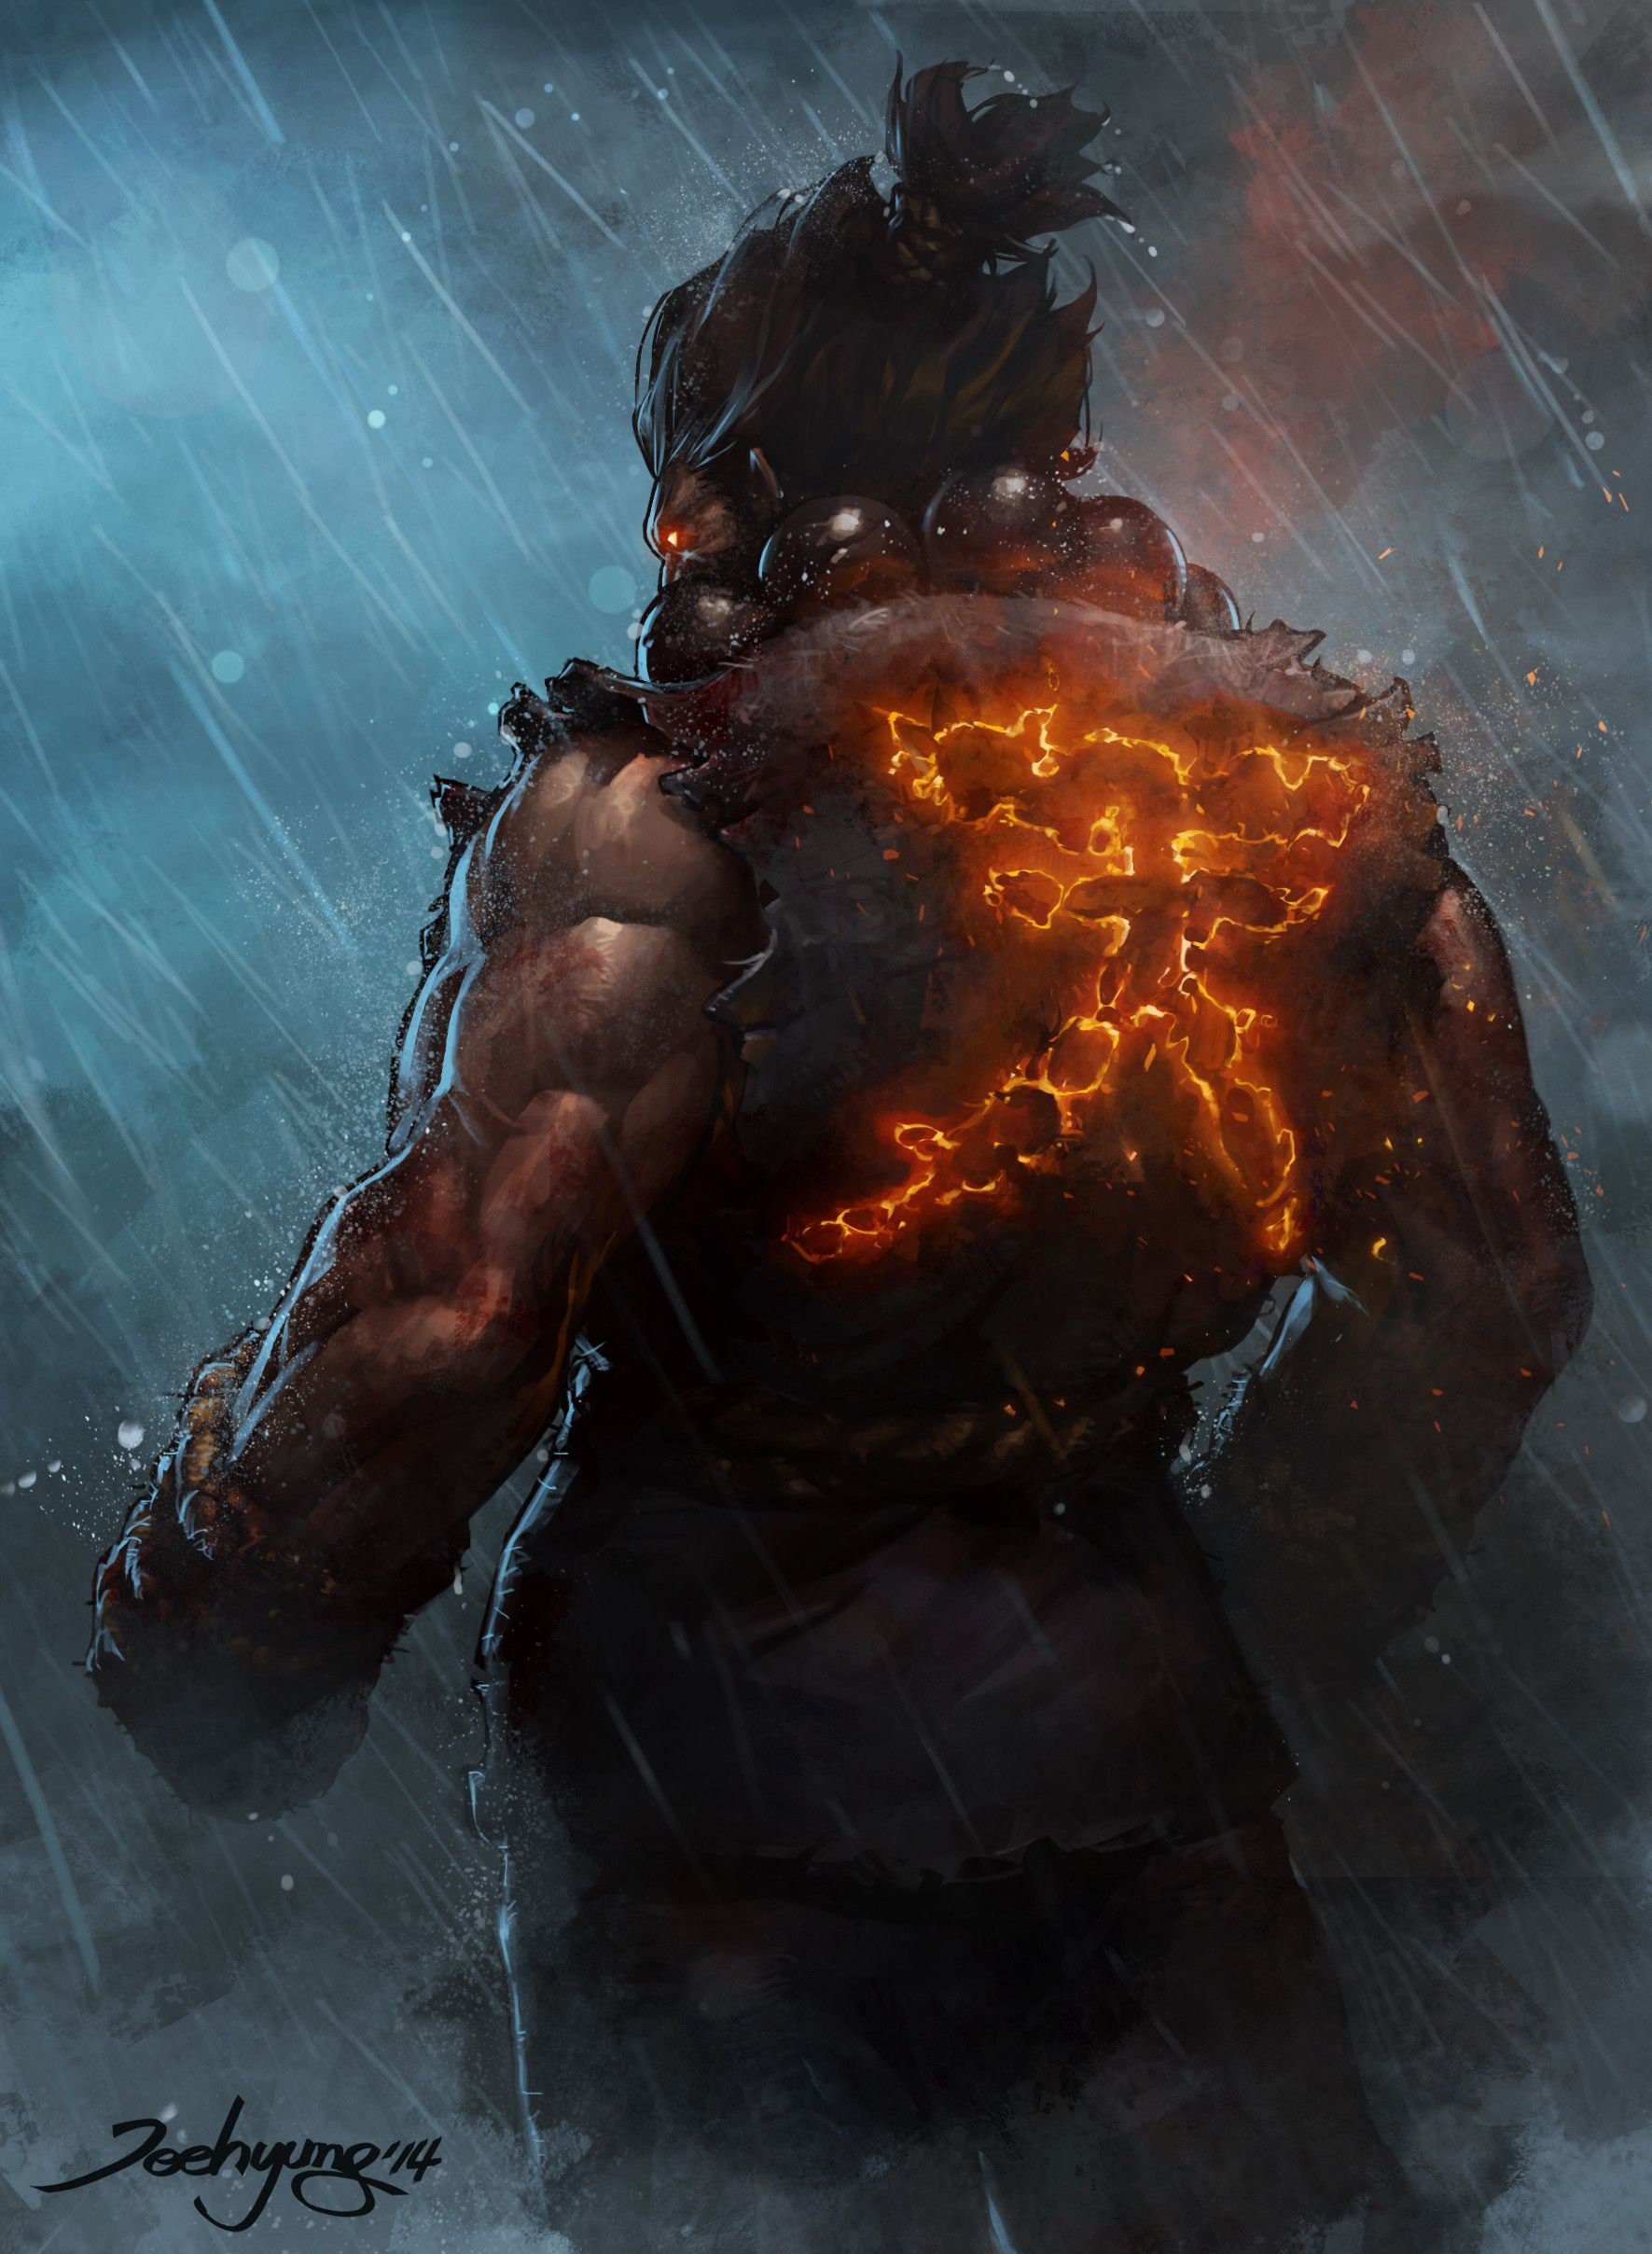 Jeehyung Jeehyung Lee Akuma Street Fighter Street Fighter Art Street Fighter